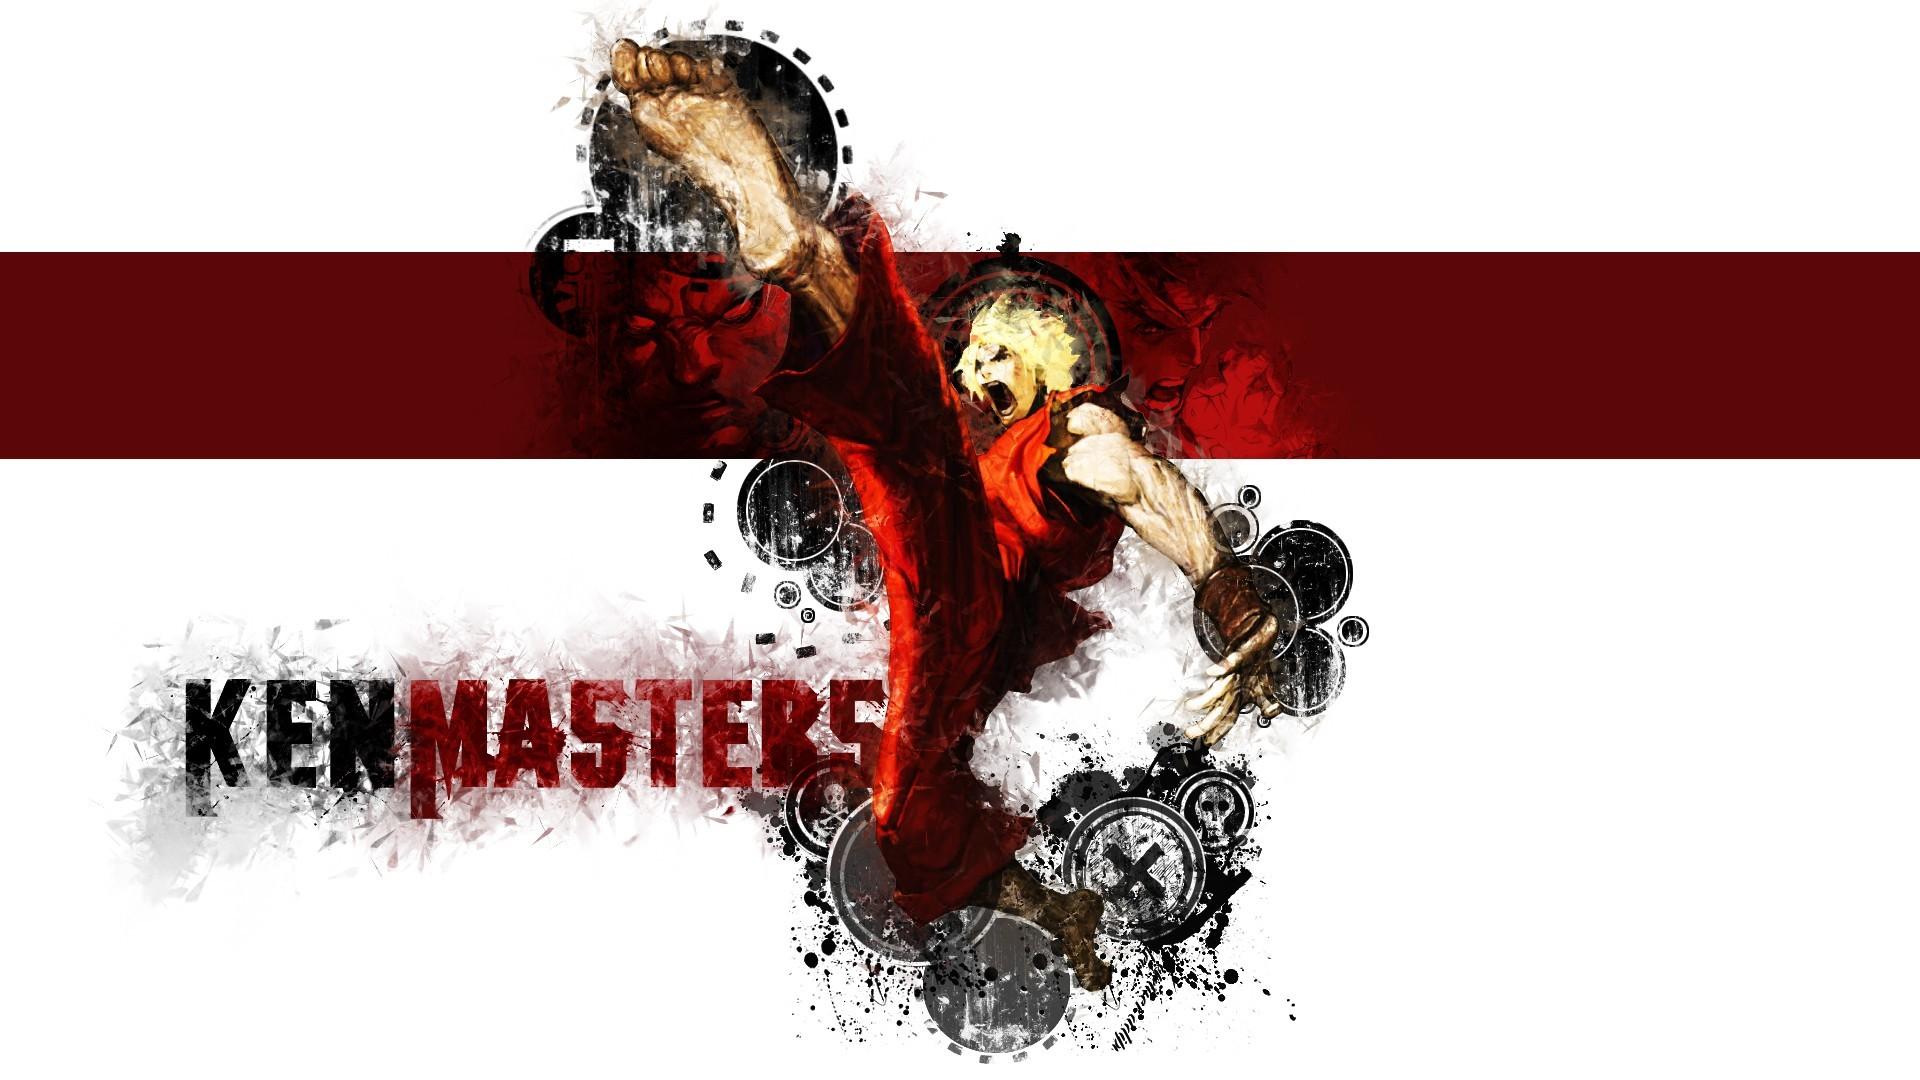 Street Fighter, Ken Masters Wallpapers HD / Desktop and Mobile Backgrounds